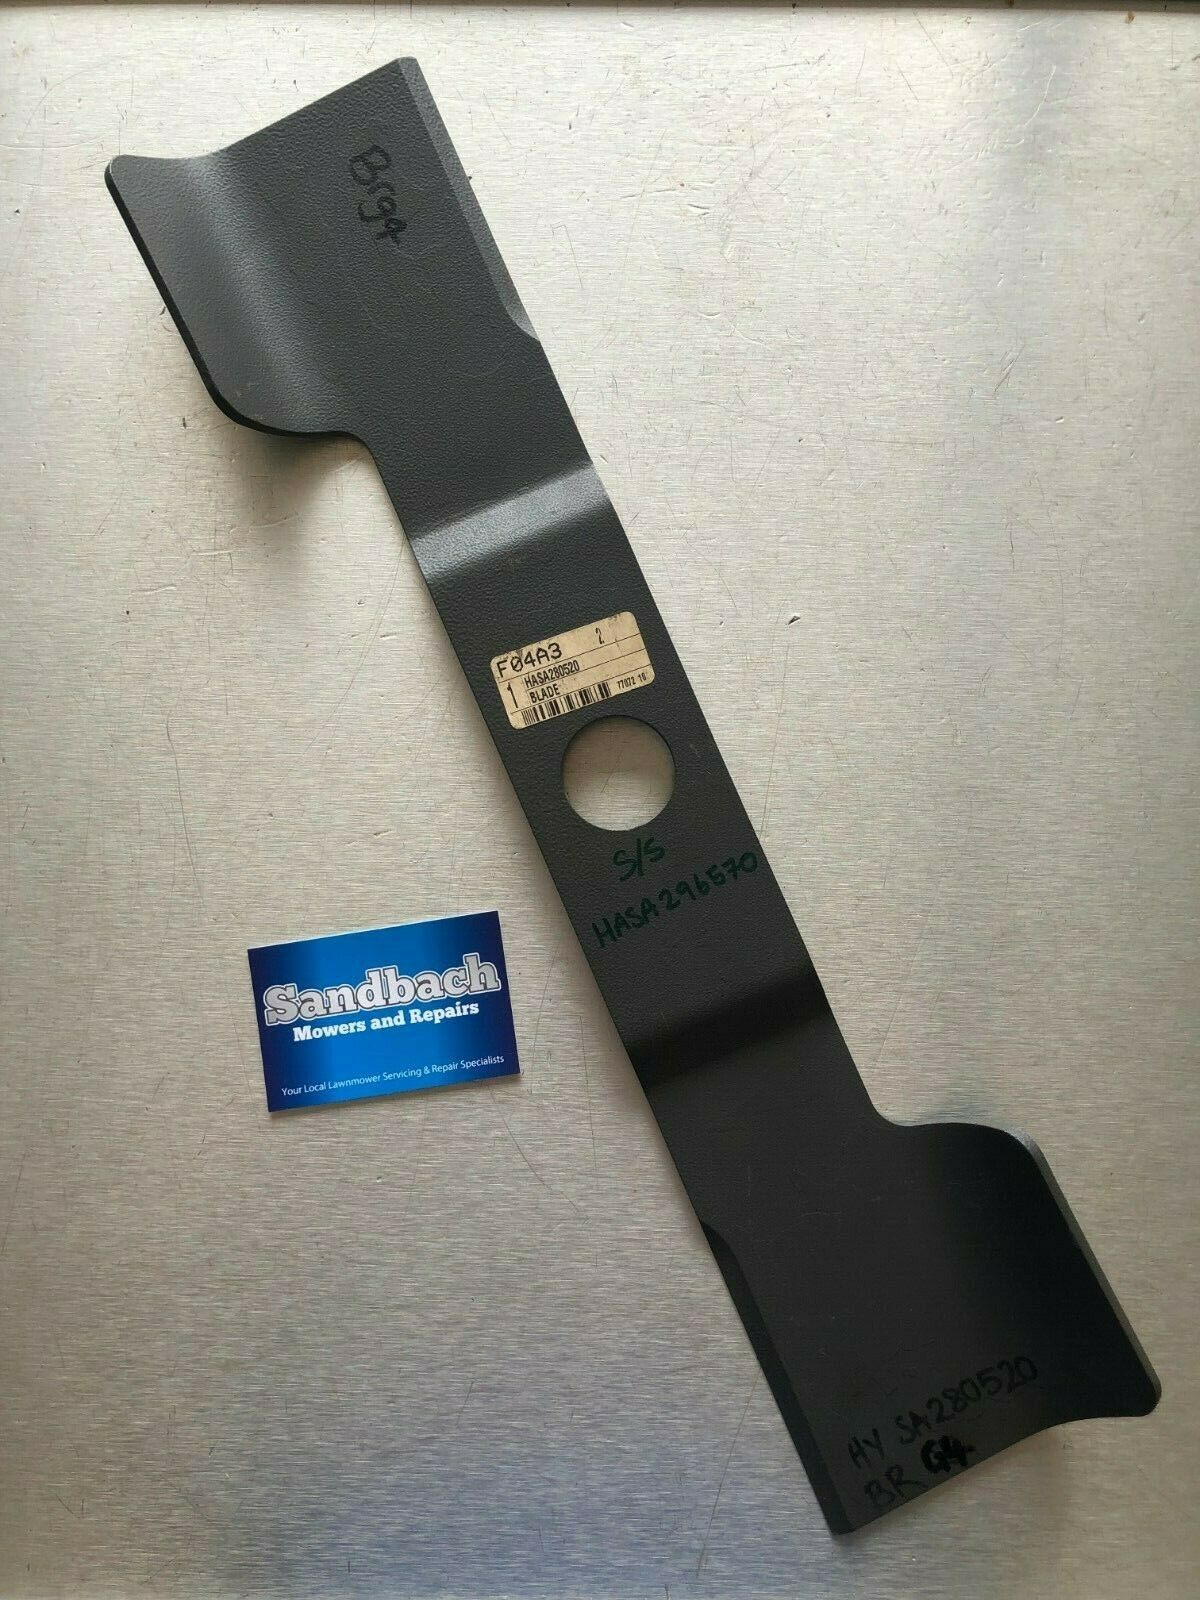 Hayter Genuino Metal cutterbar Hasa 280520 reemplaza a Hasa 296570